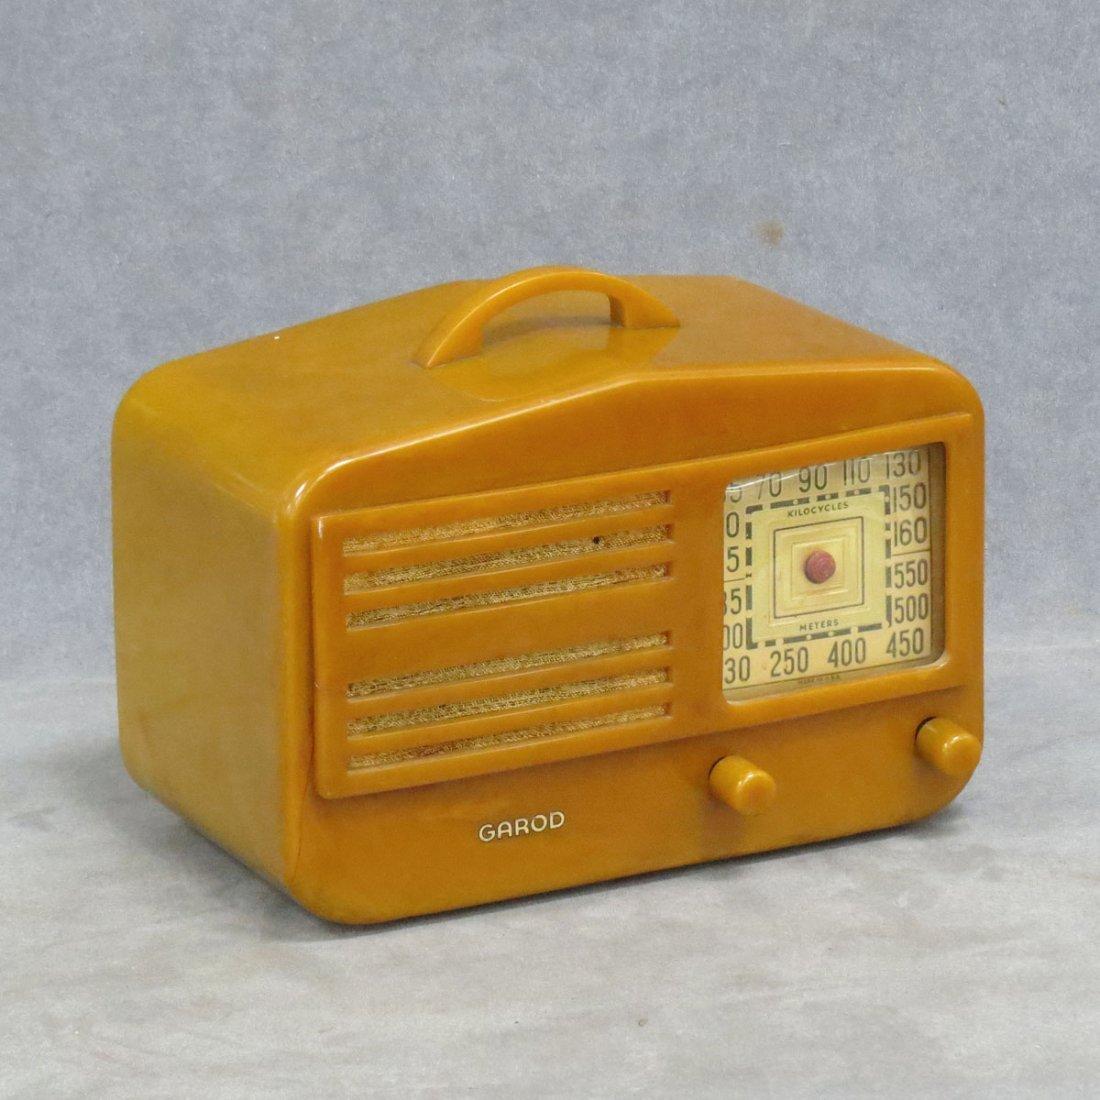 VINTAGE GAROD MOD 1450 DESK TOP RADIO